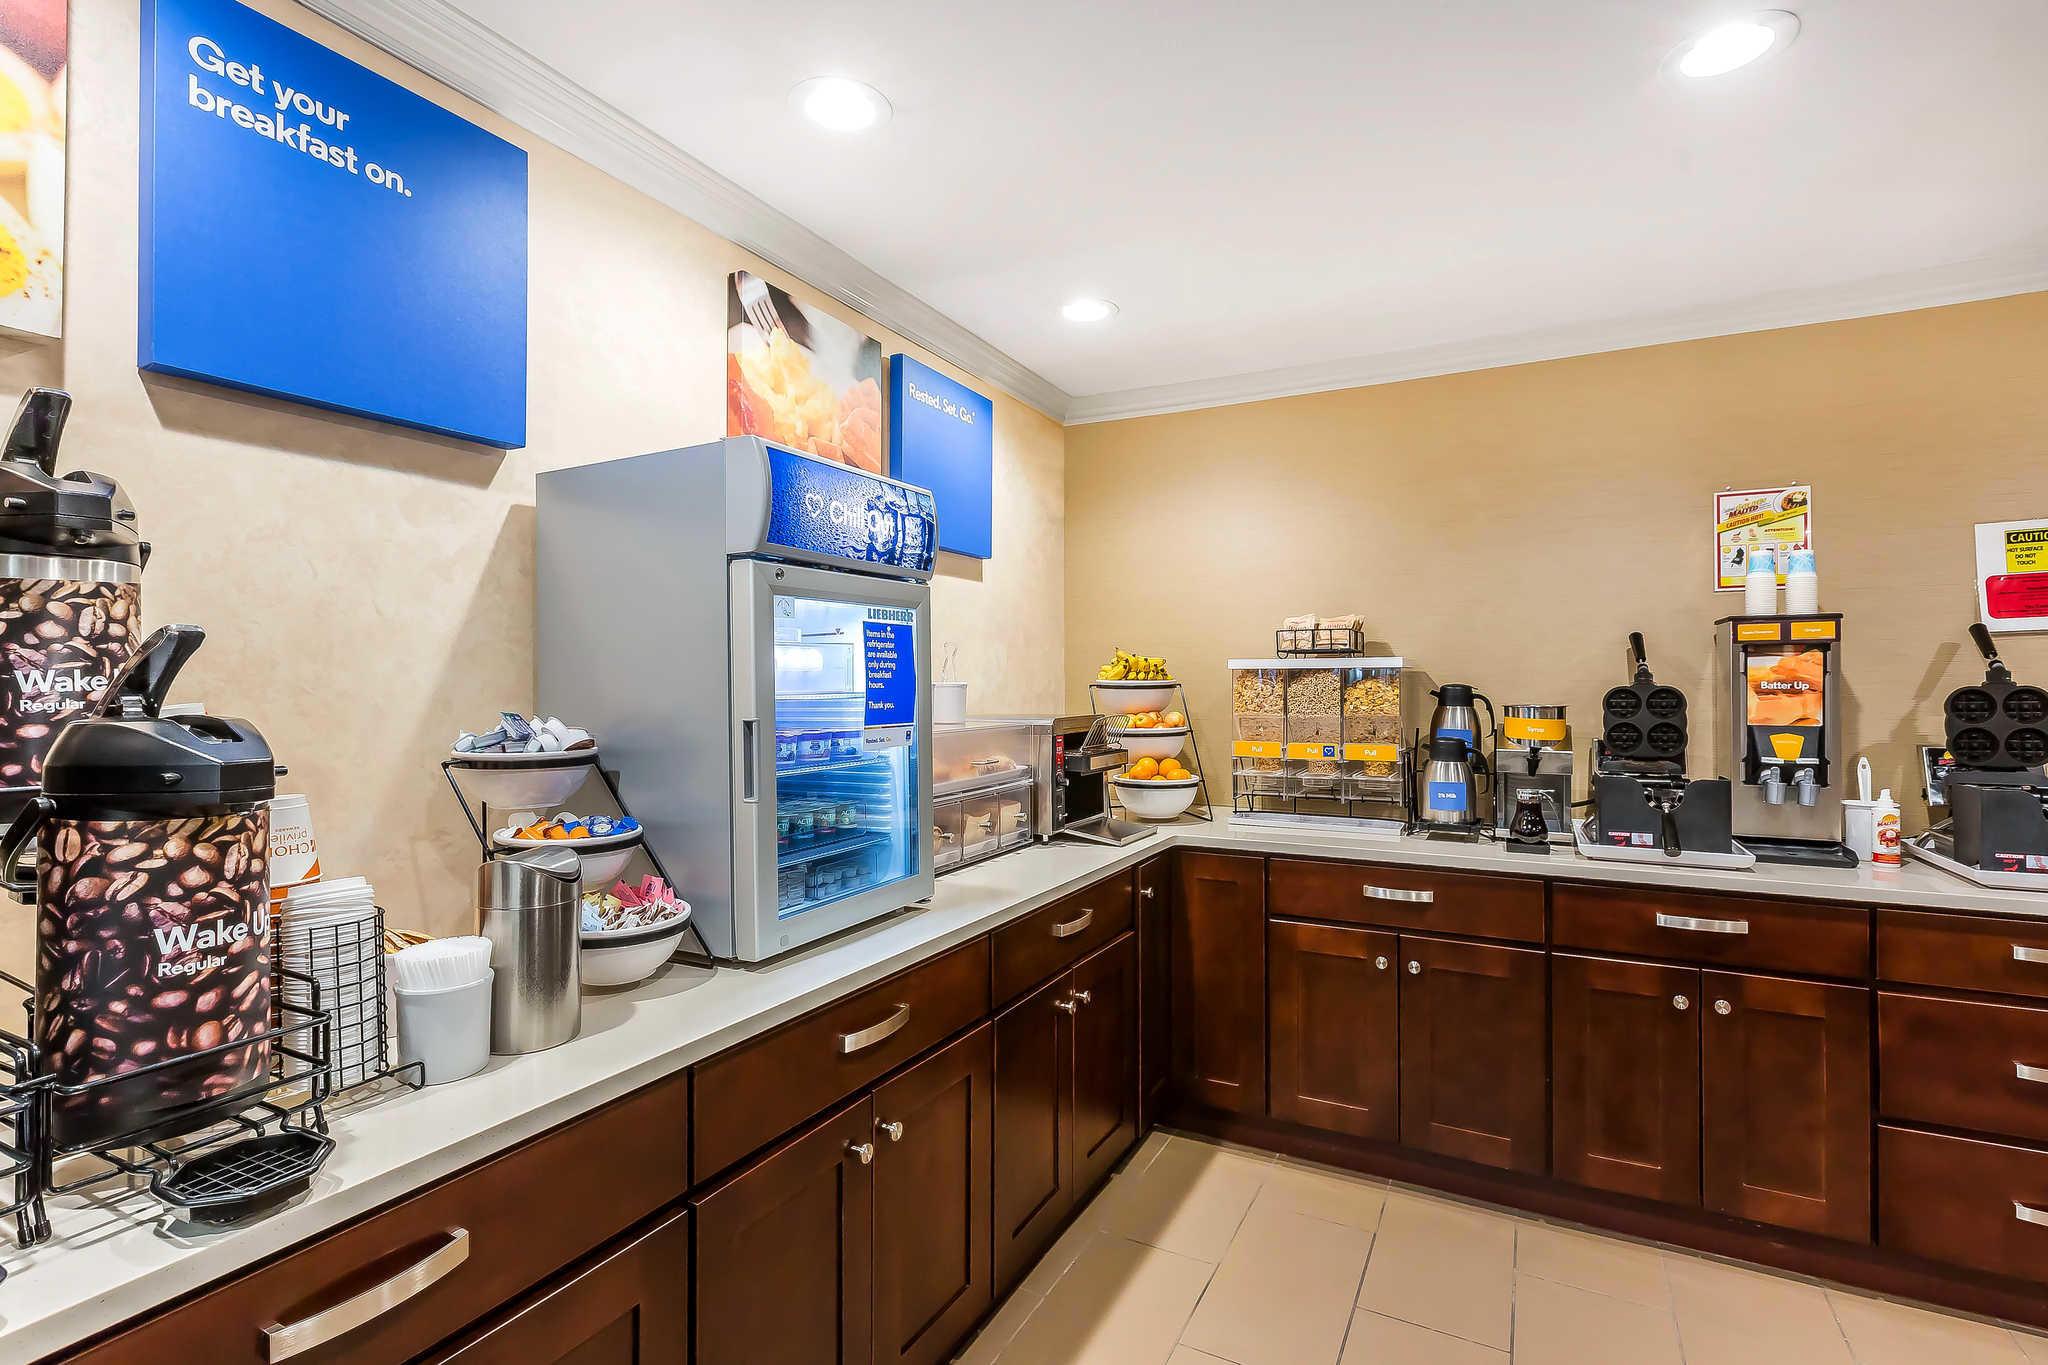 Comfort Inn Santa Monica - West Los Angeles image 41